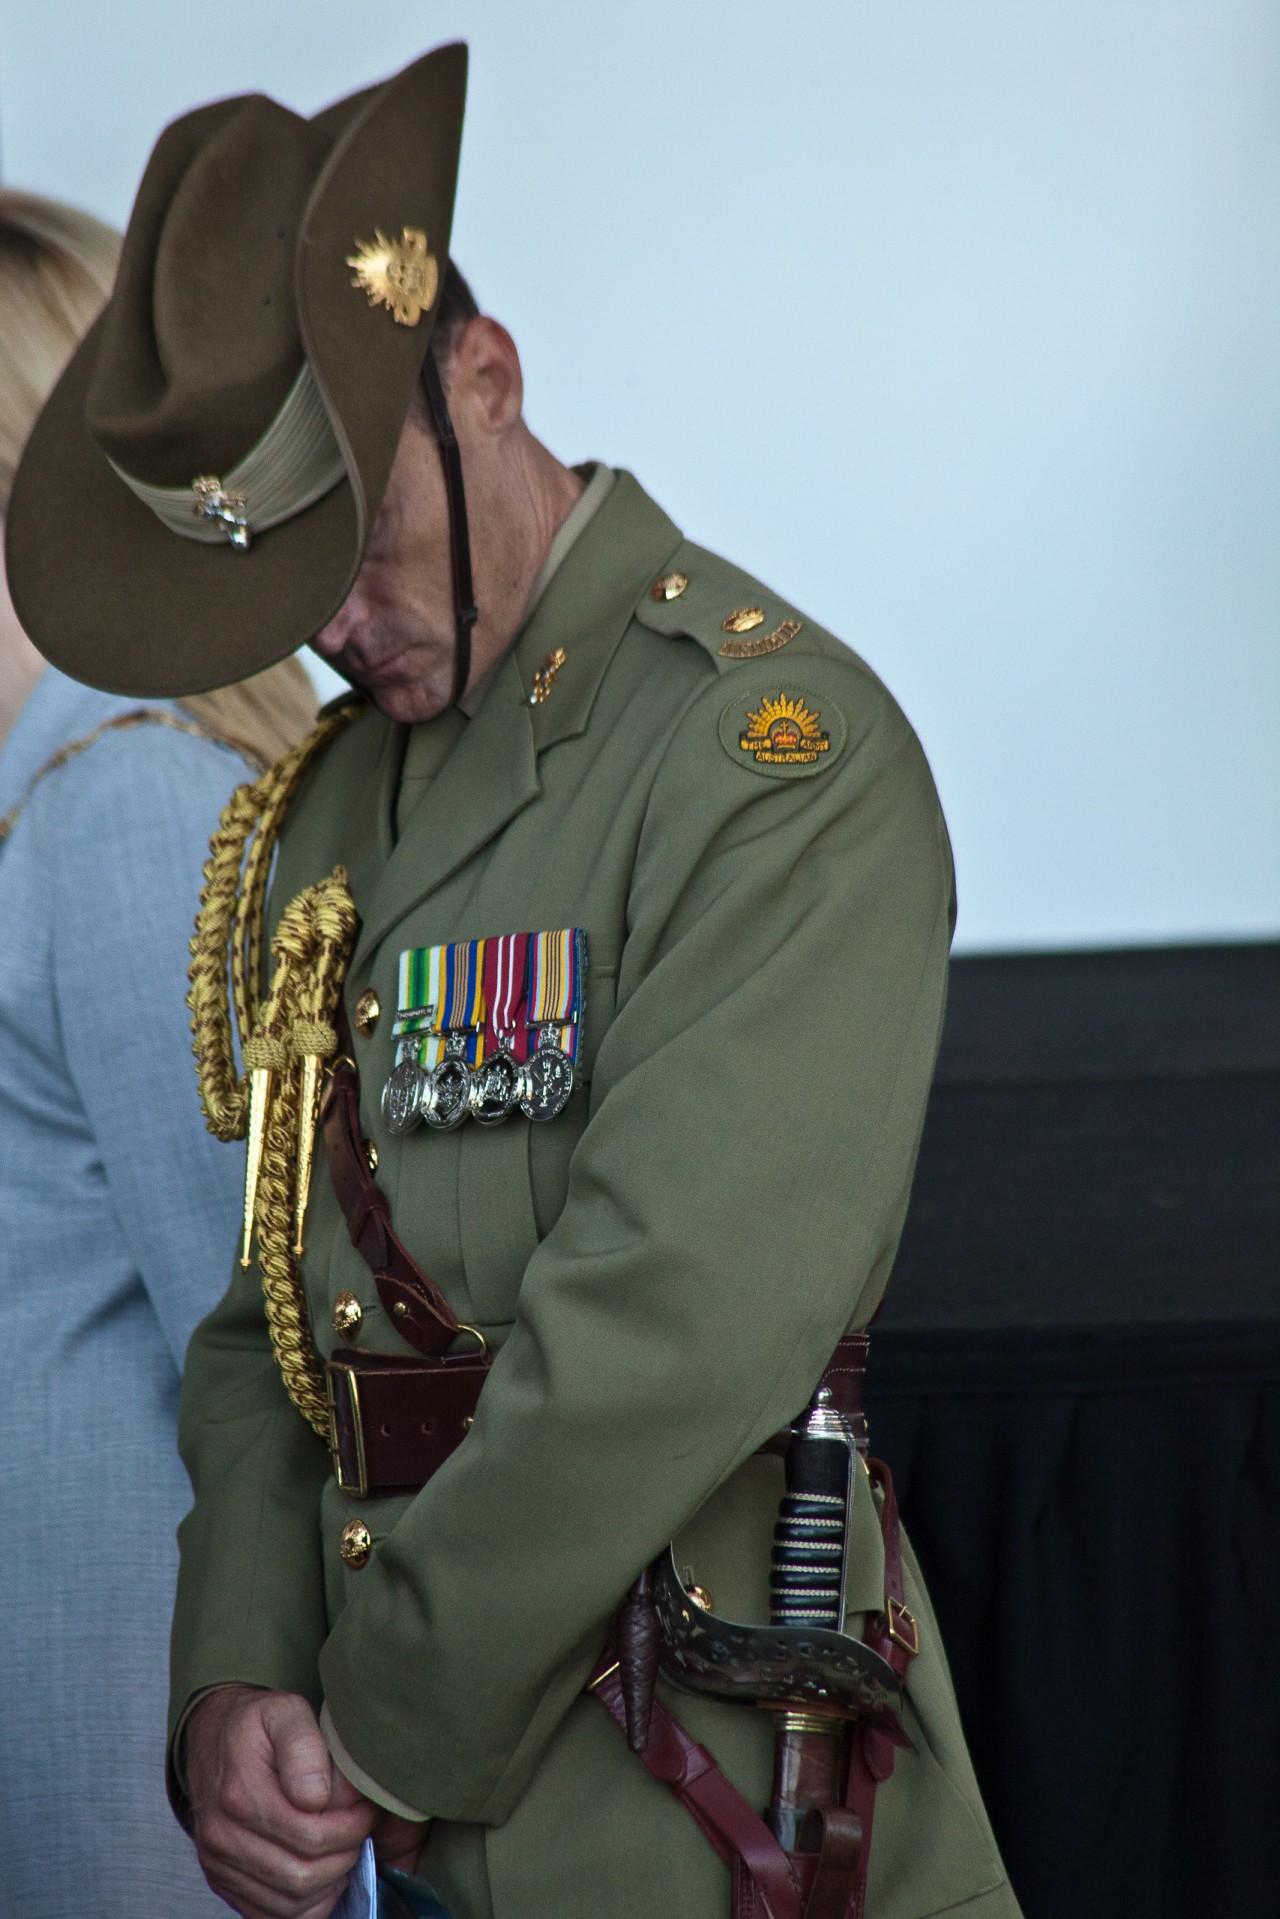 Soldier & medals